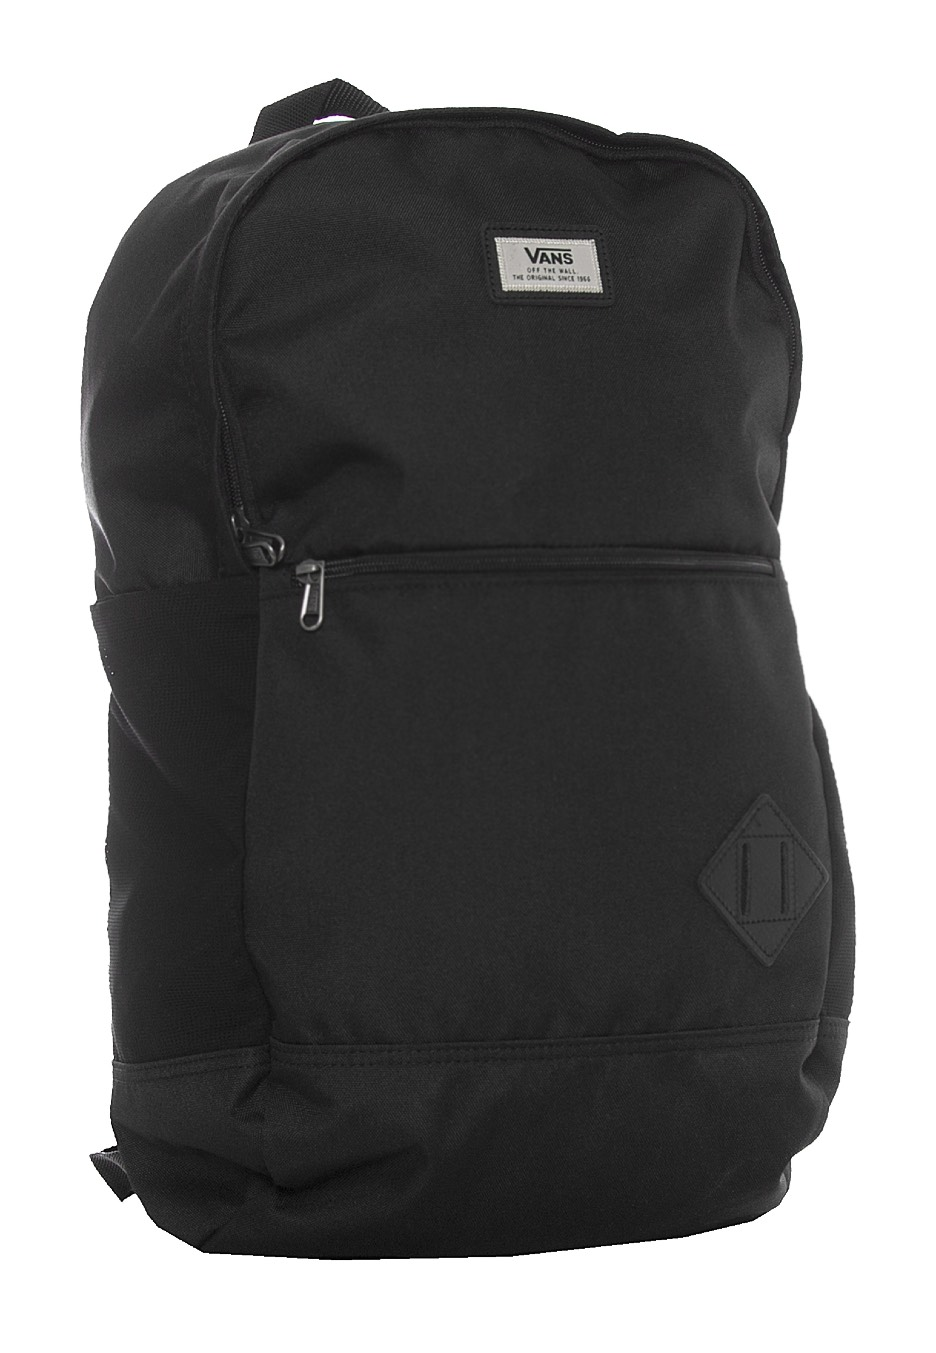 Vans - Van Doren III - Backpack - Impericon.com Worldwide 4aea1e3adb6